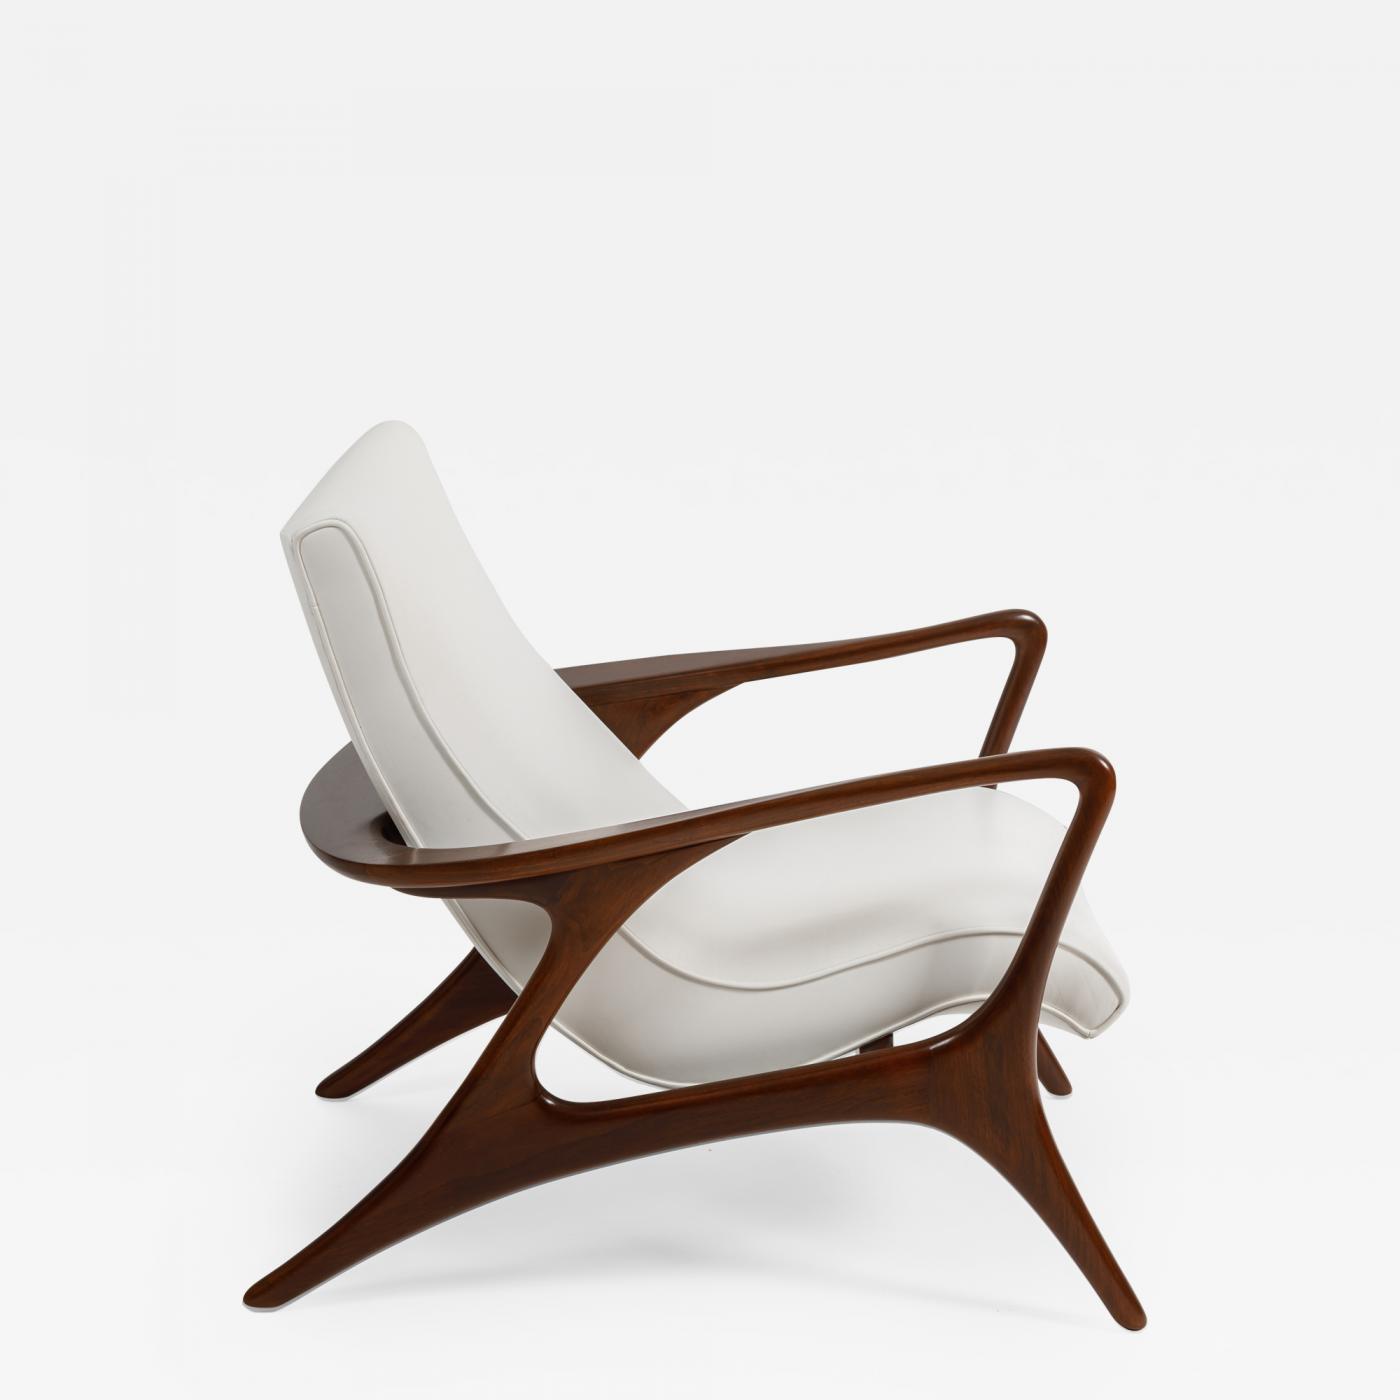 Awe Inspiring Vladimir Kagan Early Contour Lounge Chair By Vladimir Kagan Creativecarmelina Interior Chair Design Creativecarmelinacom